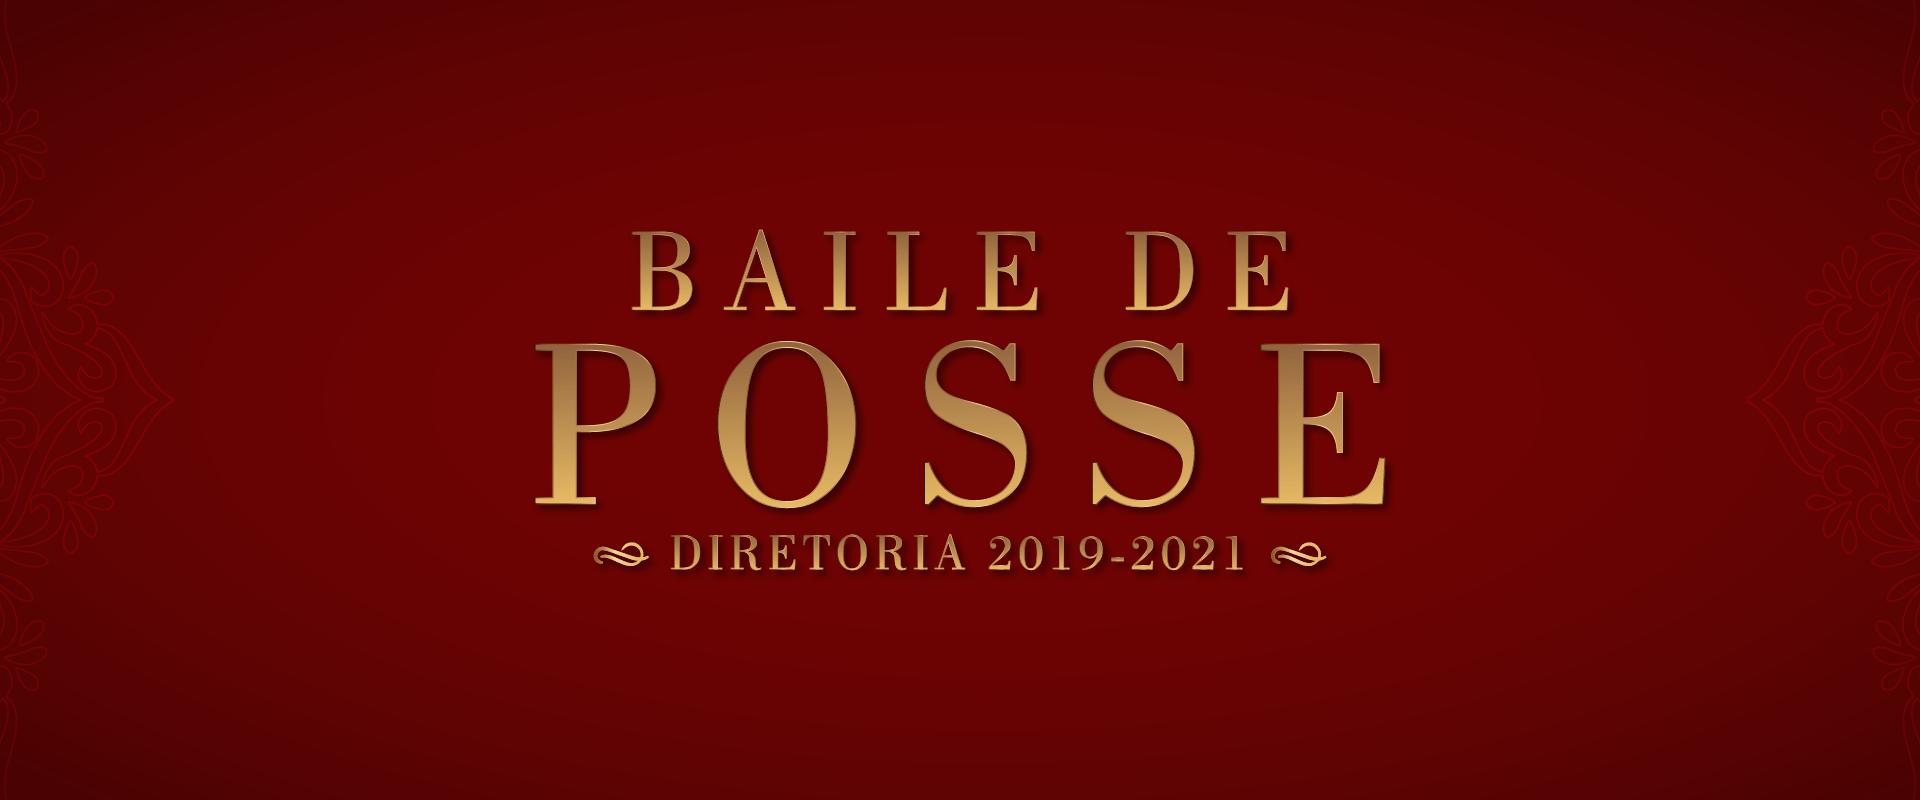 site_Baile de Posse_baixa_Site_banner